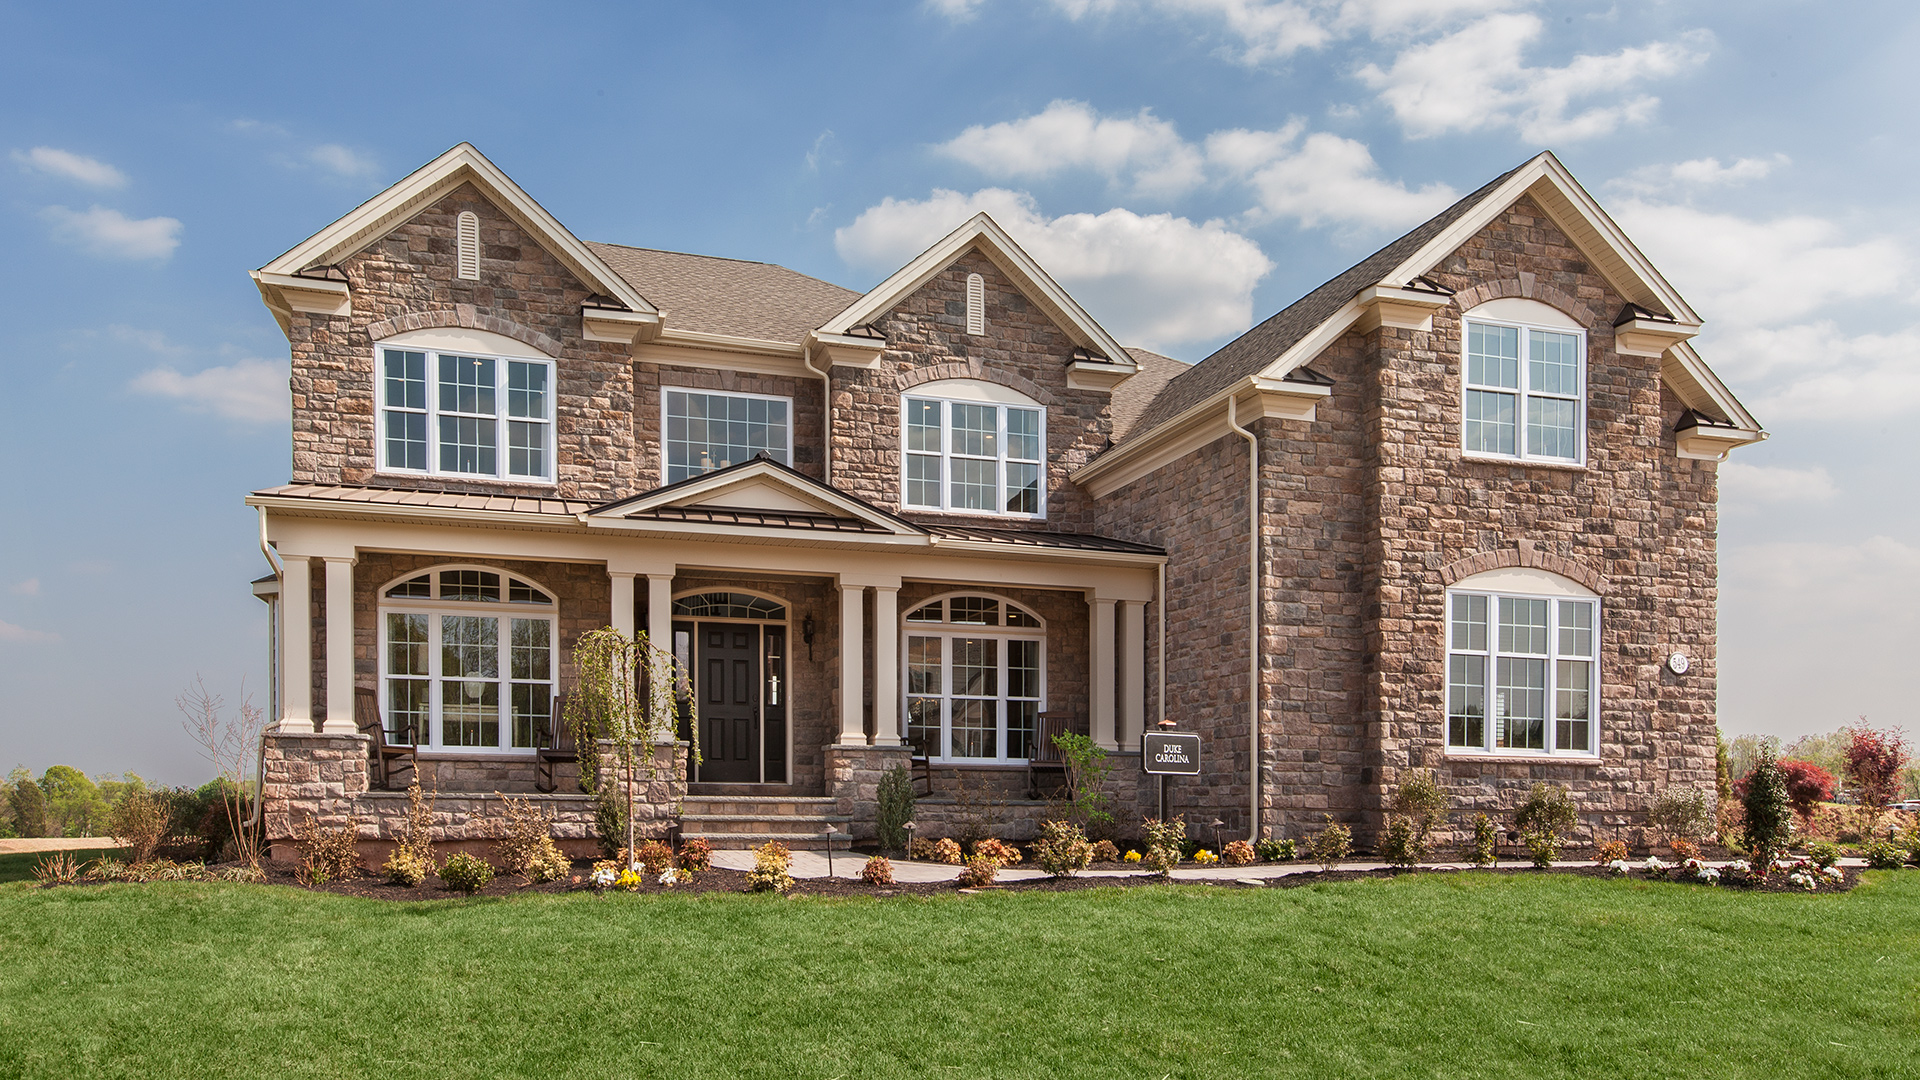 Duke Carolina Model Home